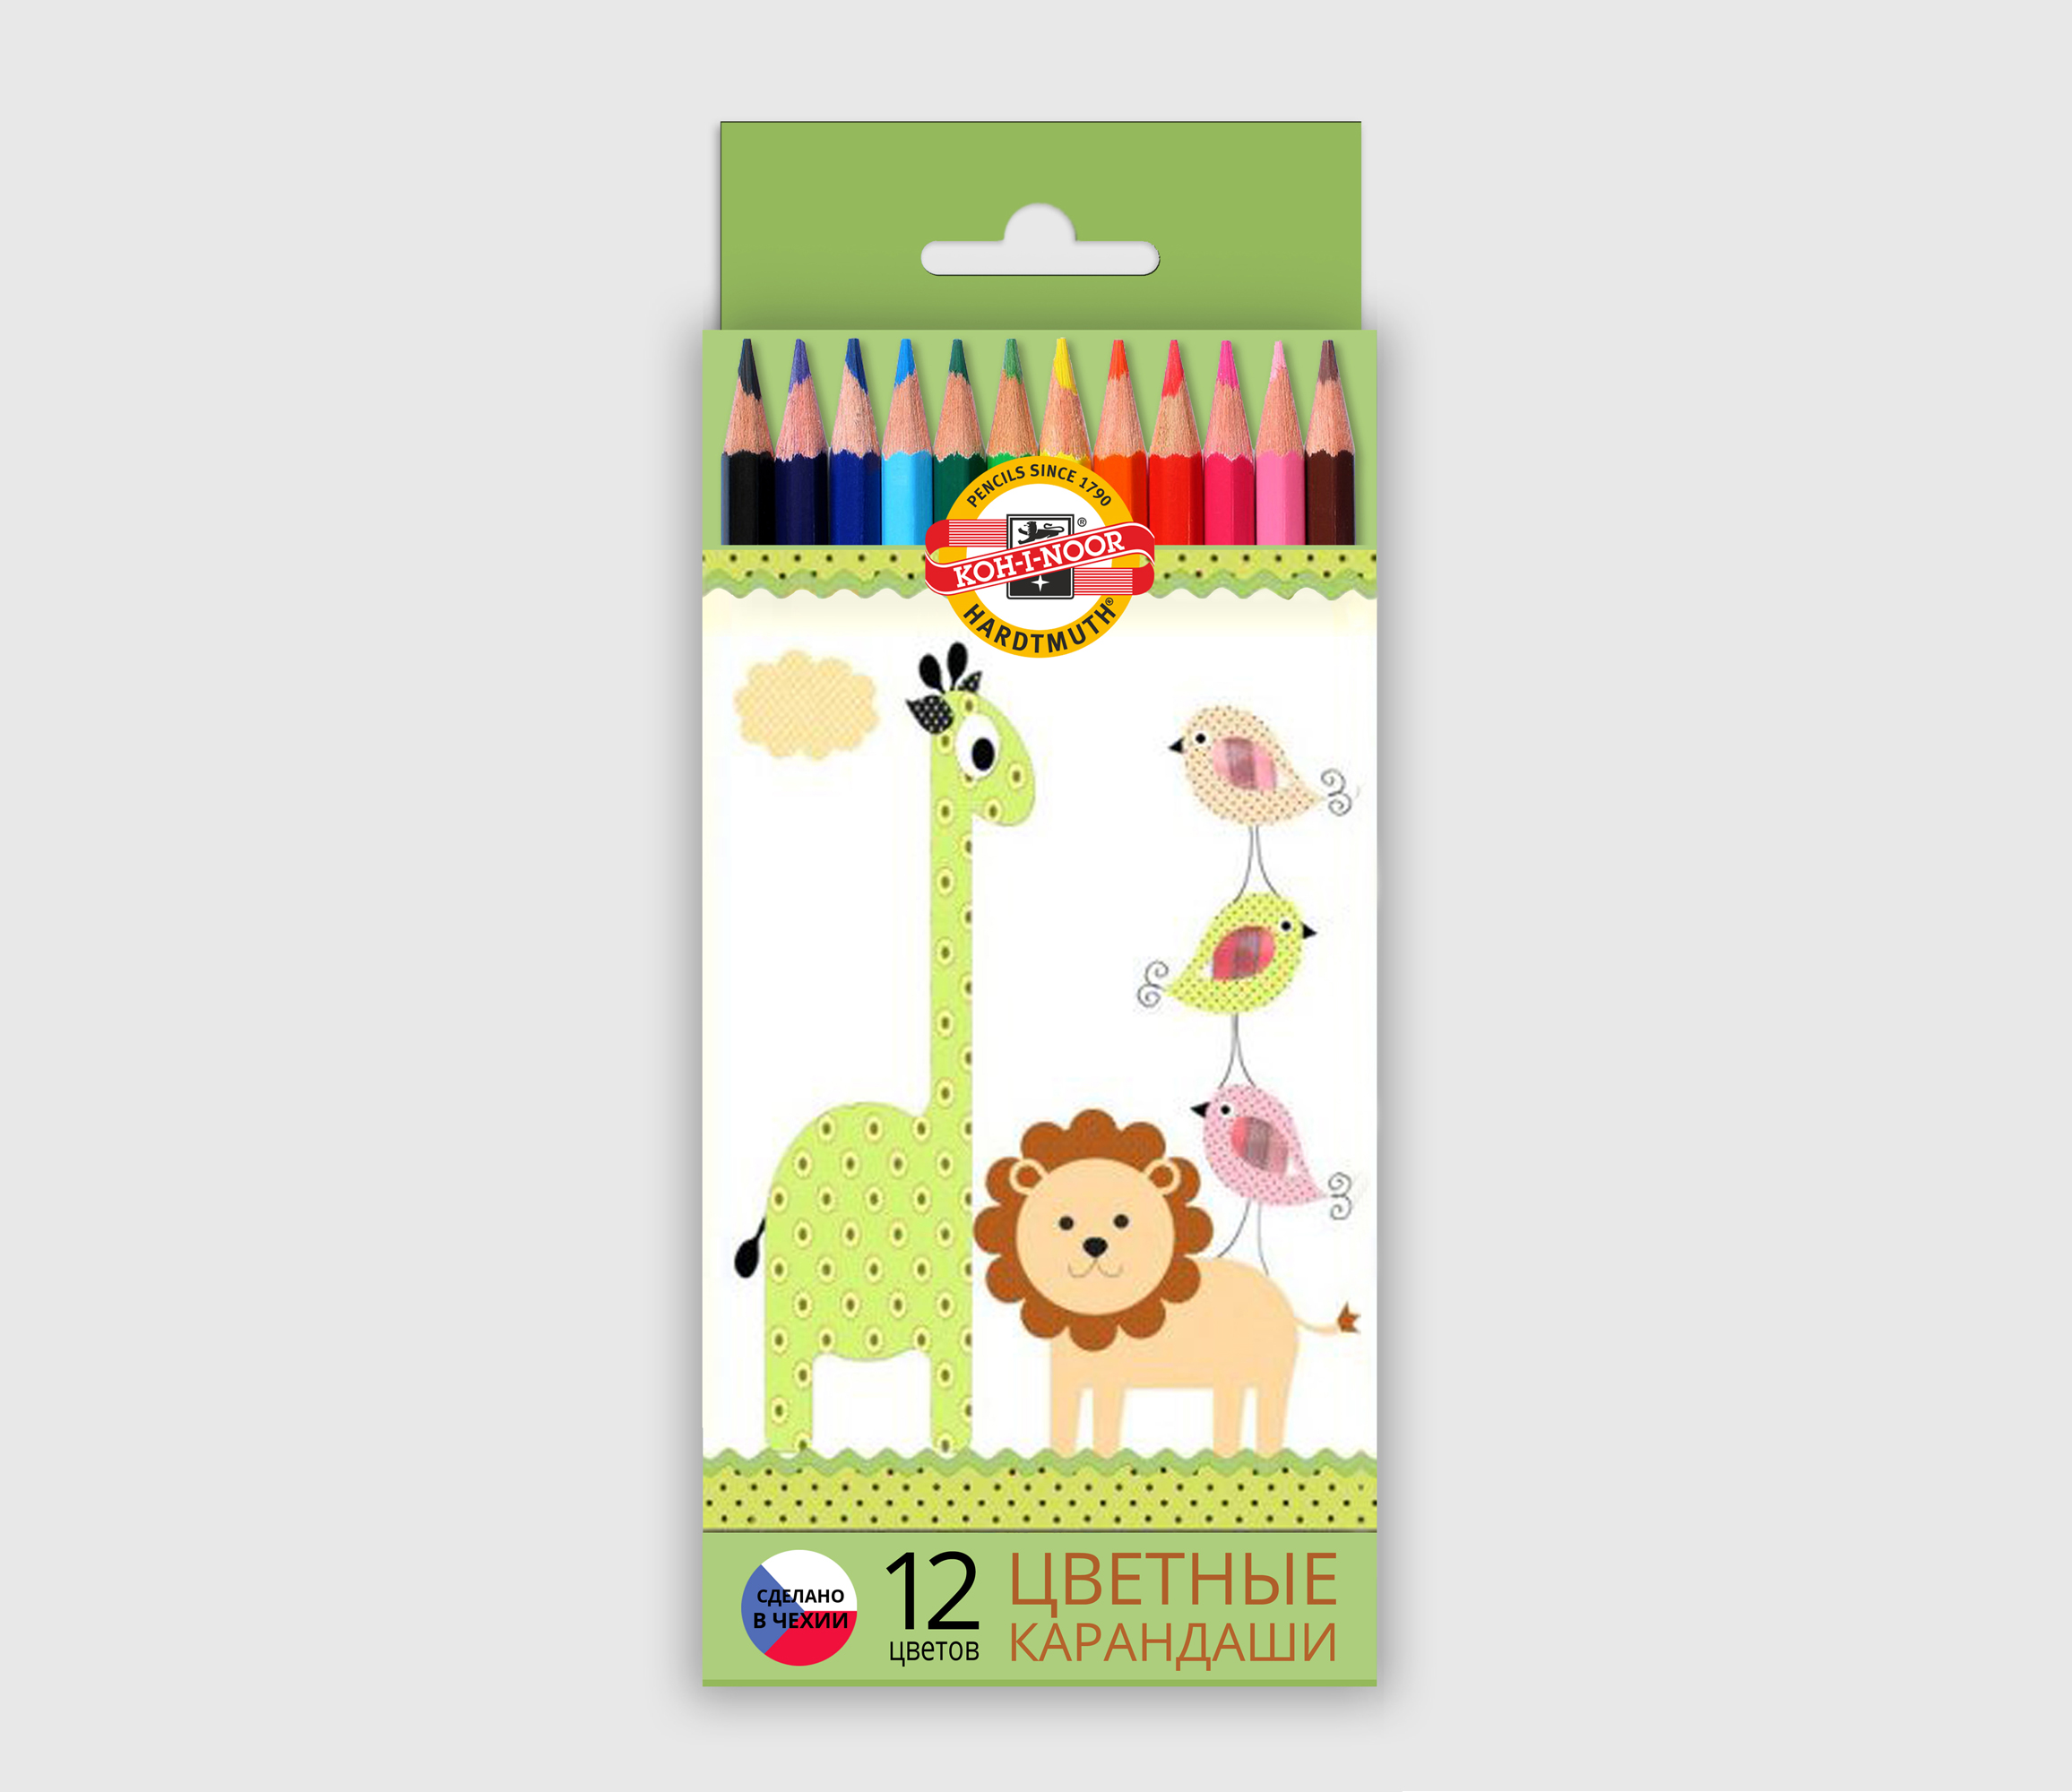 Разработка дизайна упаковки для чешского бренда KOH-I-NOOR фото f_29259f89d0f98190.jpg